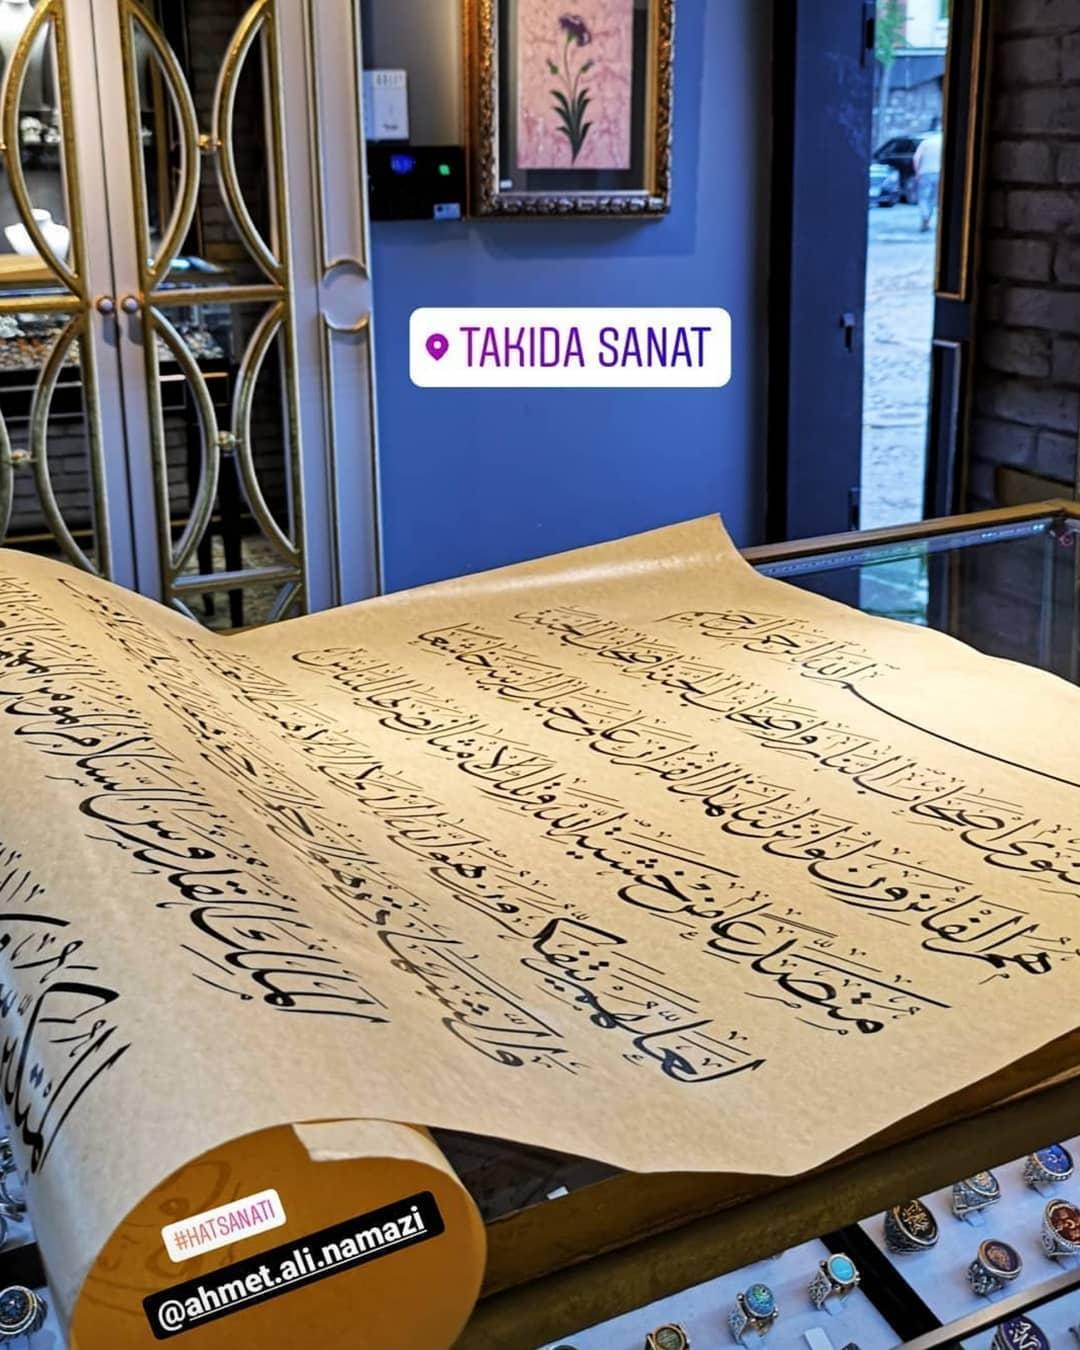 al kattat احمدعلی نمازی  …..Haşr Suresi 20-24 ayetleri…. .. @takidasanat . . . . . . . . . .#islamic … 547